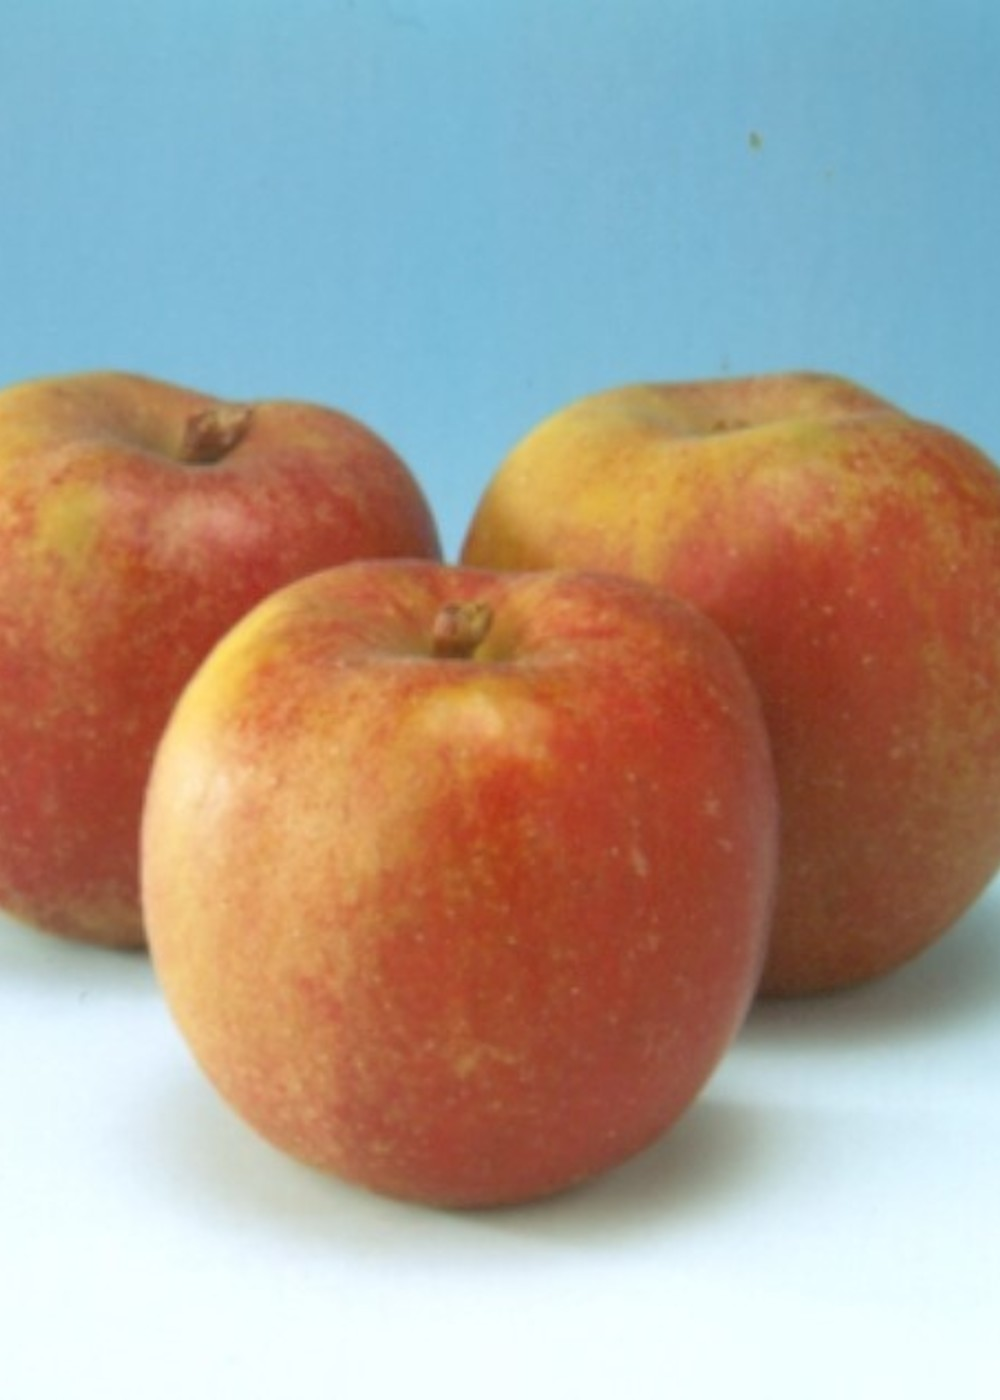 Apfel 'Rode Boskoop' | Malus domestica 'Rode Boskoop'